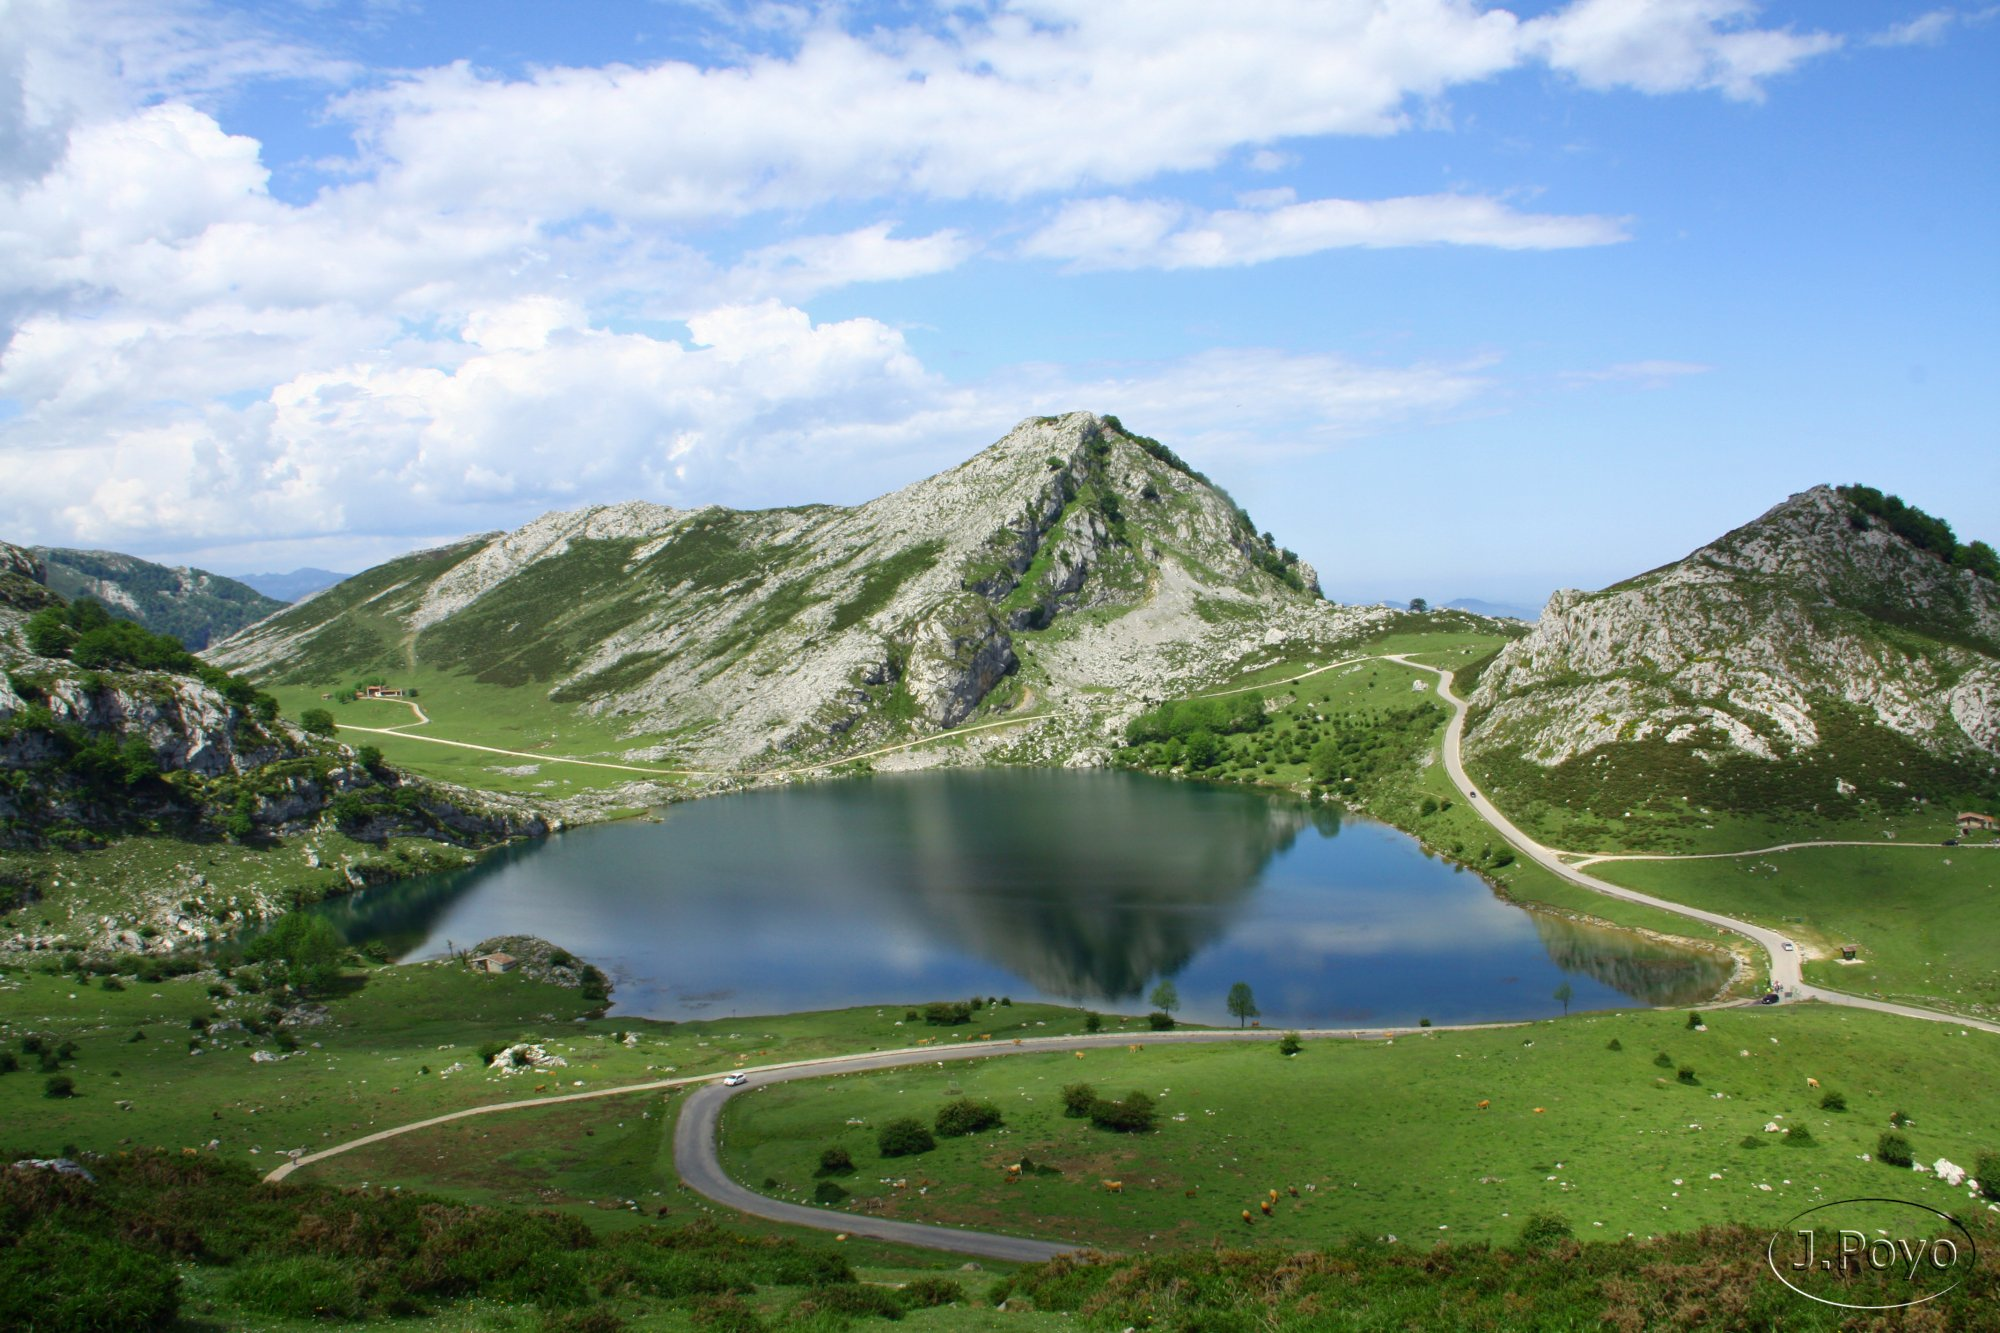 Rutas por Asturias: Lago Enol